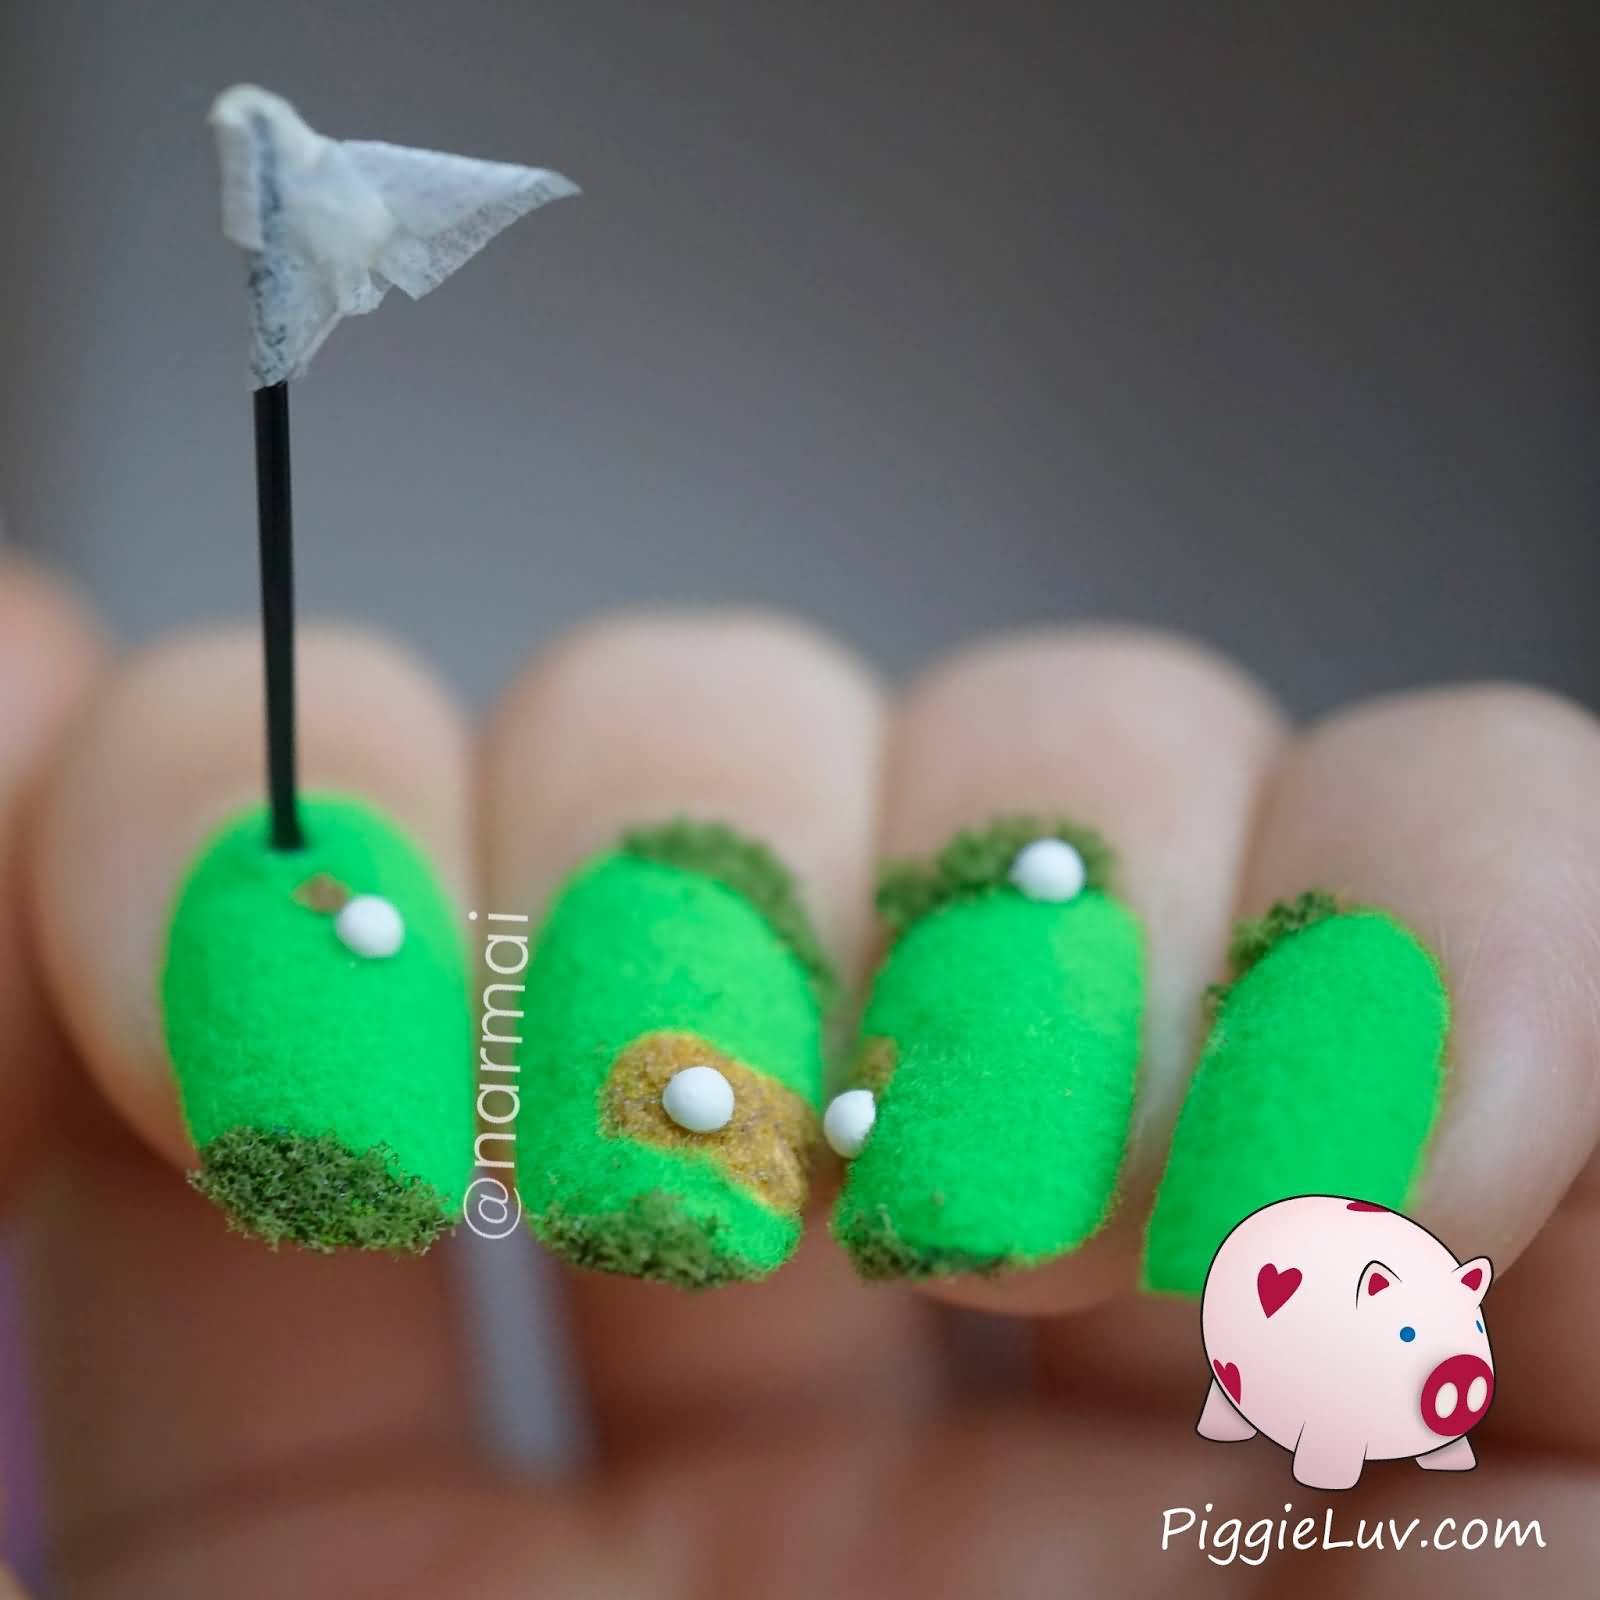 Most Unique Golf Course With Green Carpet 3D Nail Art